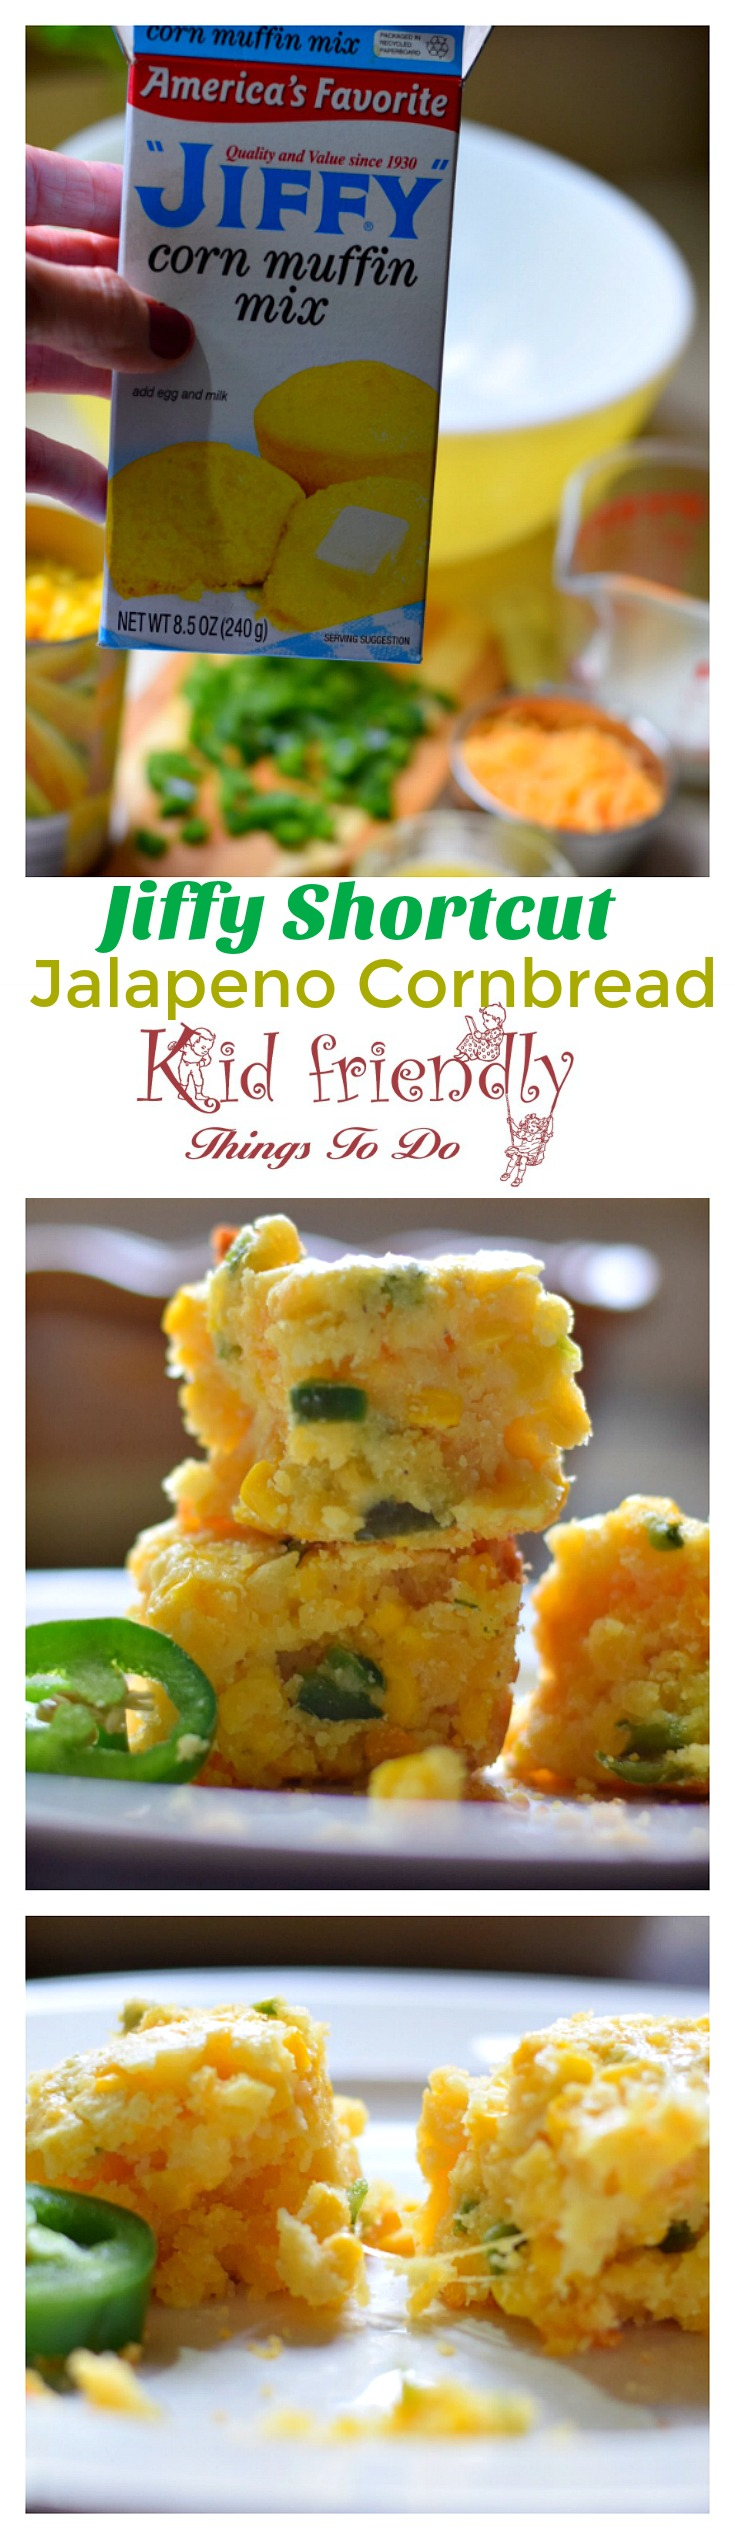 Shortcut Jalapeno and Cheese Corn Bread Using Jiffy Mix #mexicancornbreadcasserole